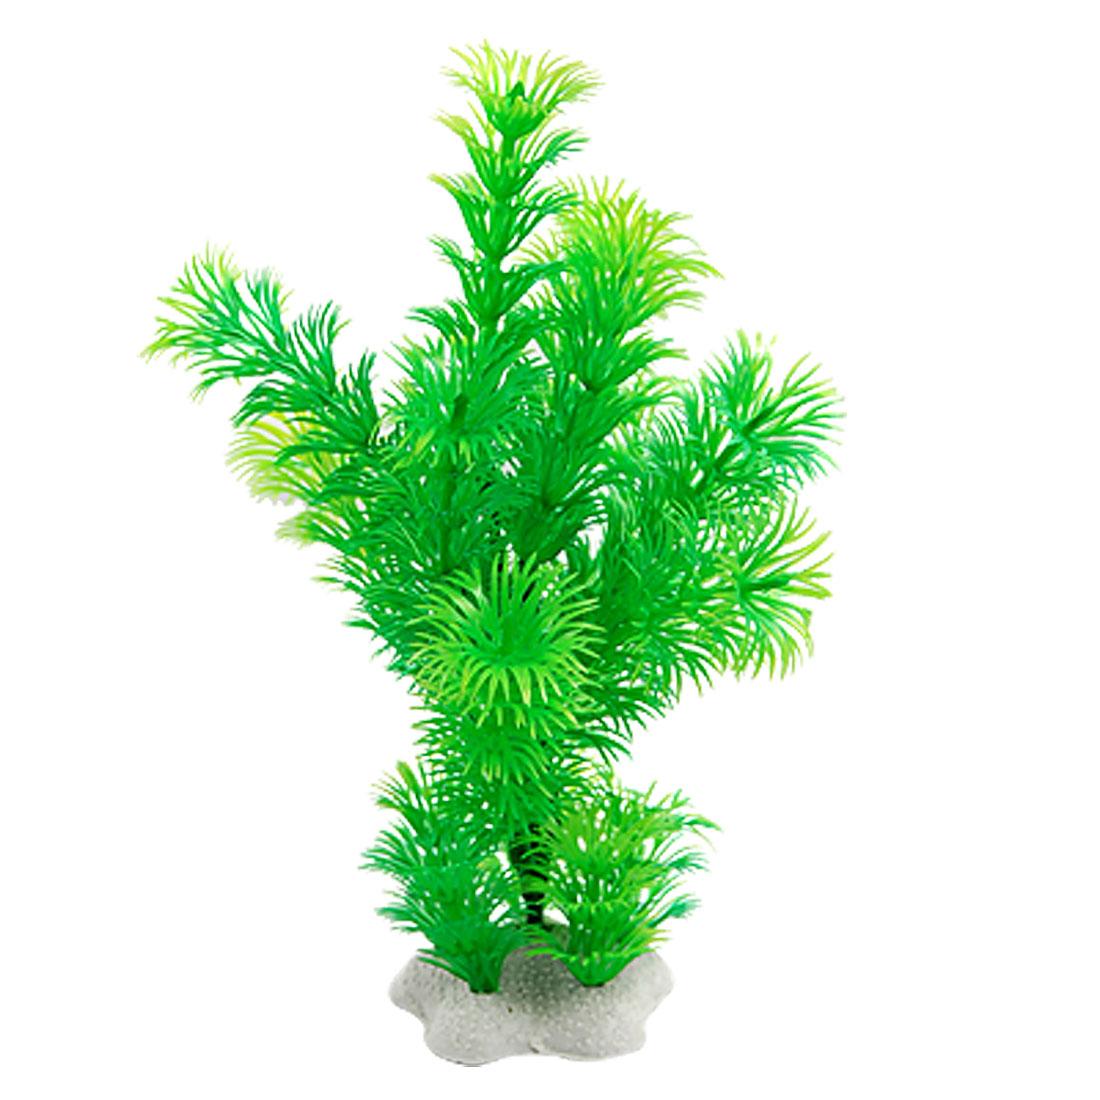 "Fish Tank 7.5"" Height Green Plastic Water Plant Grass Decoration"